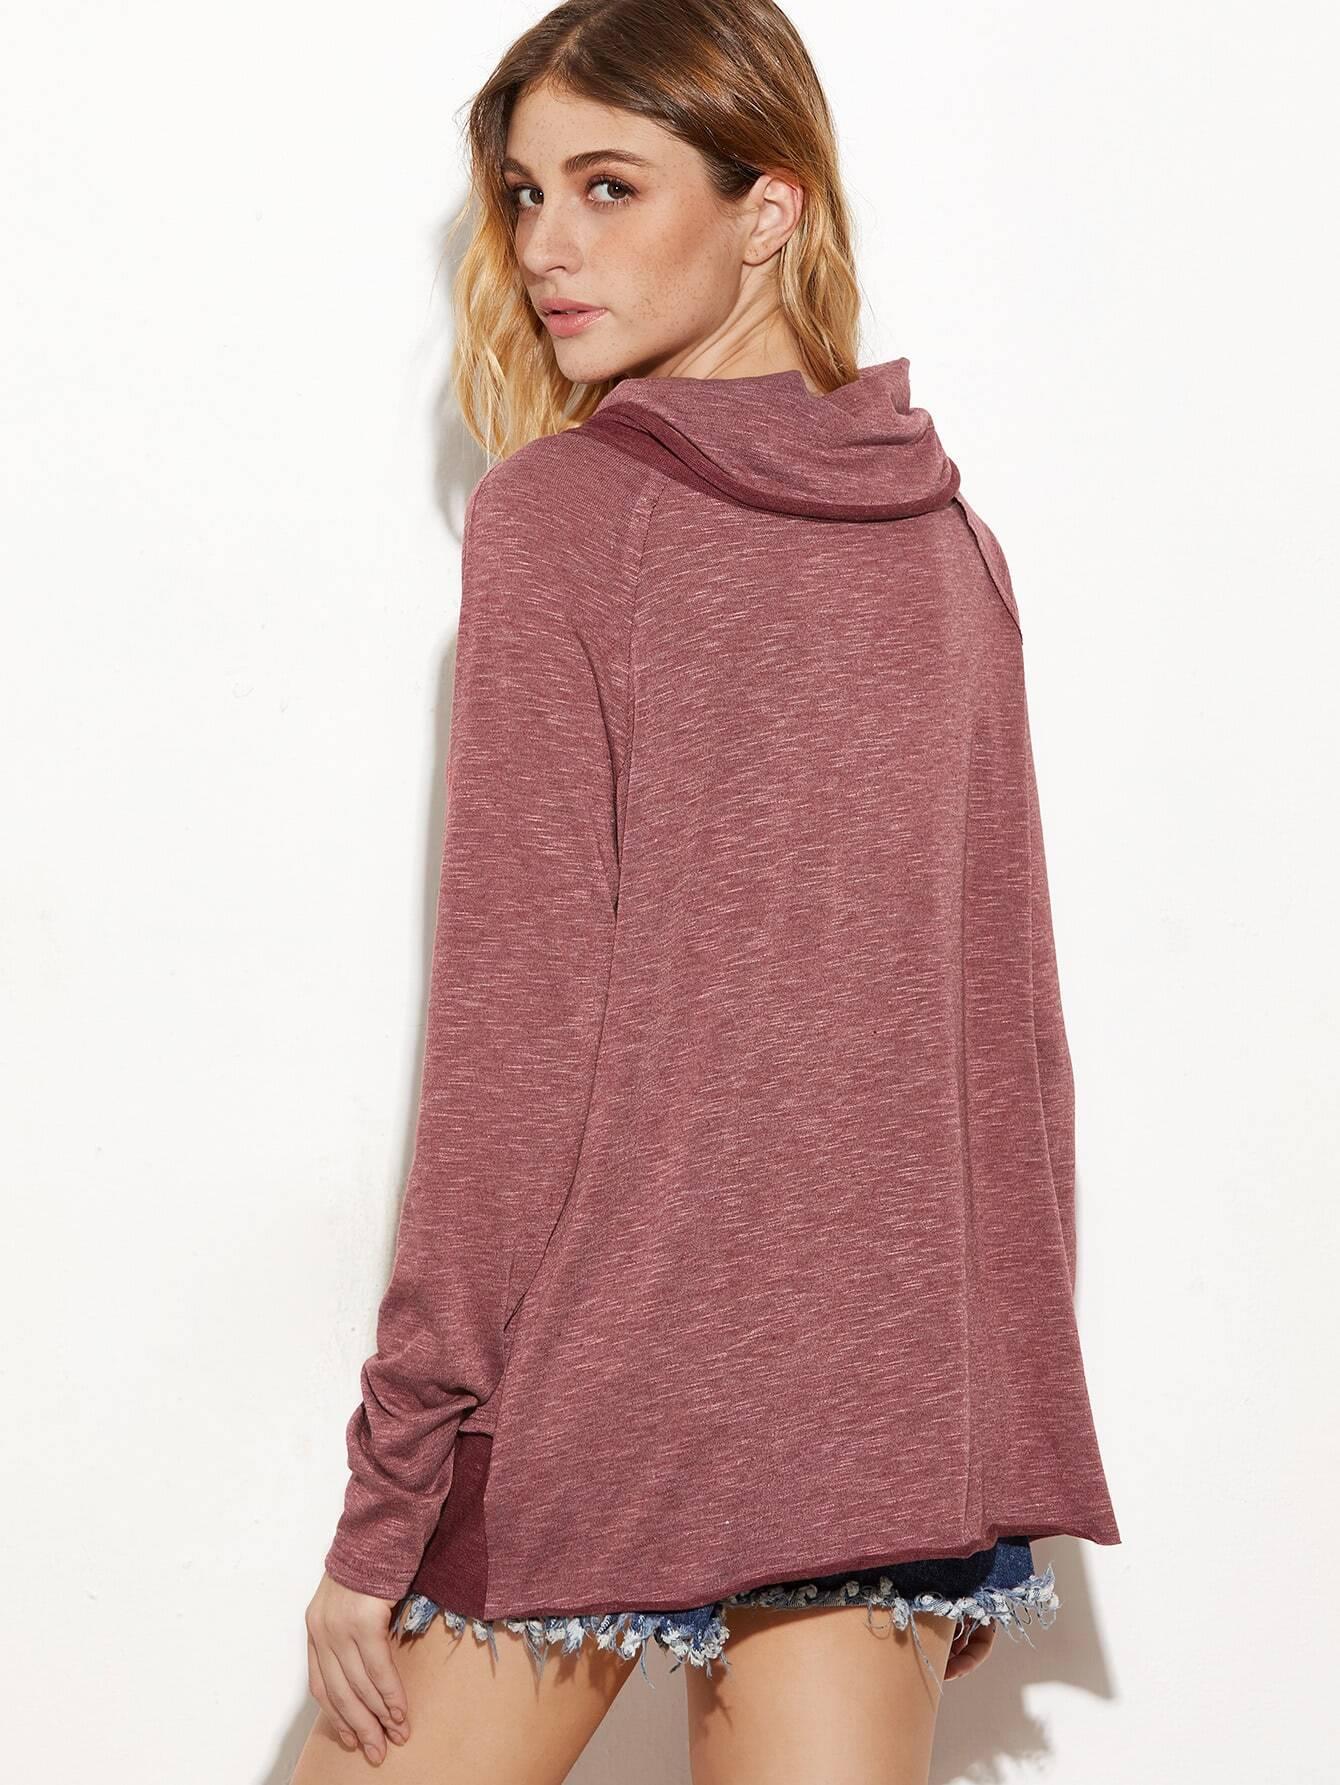 Burgundy Marled Cowl Neck Raglan Sleeve T-shirt